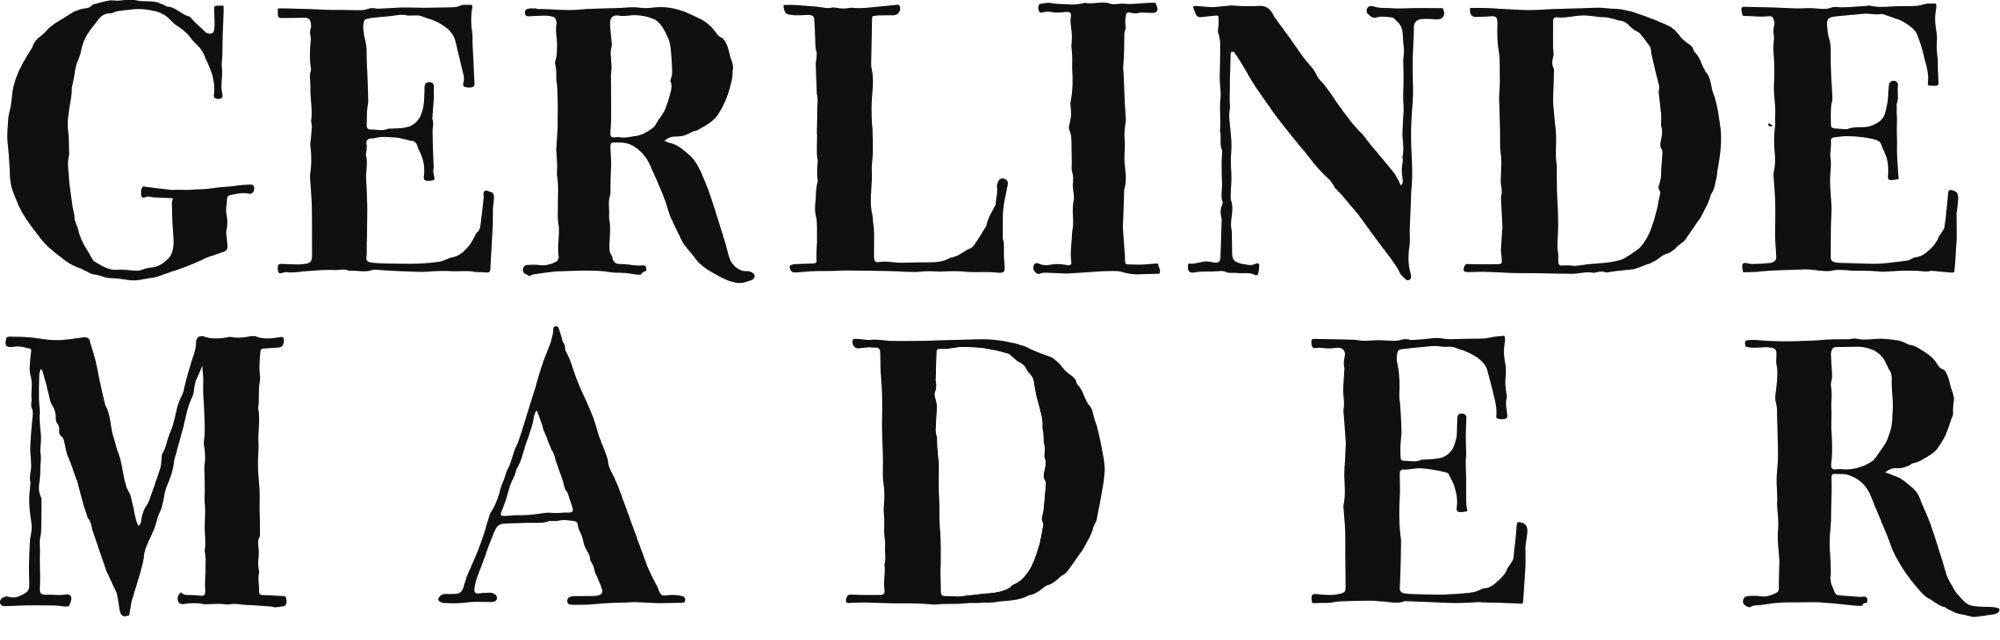 Gerlinde Mader Logoschriftzug